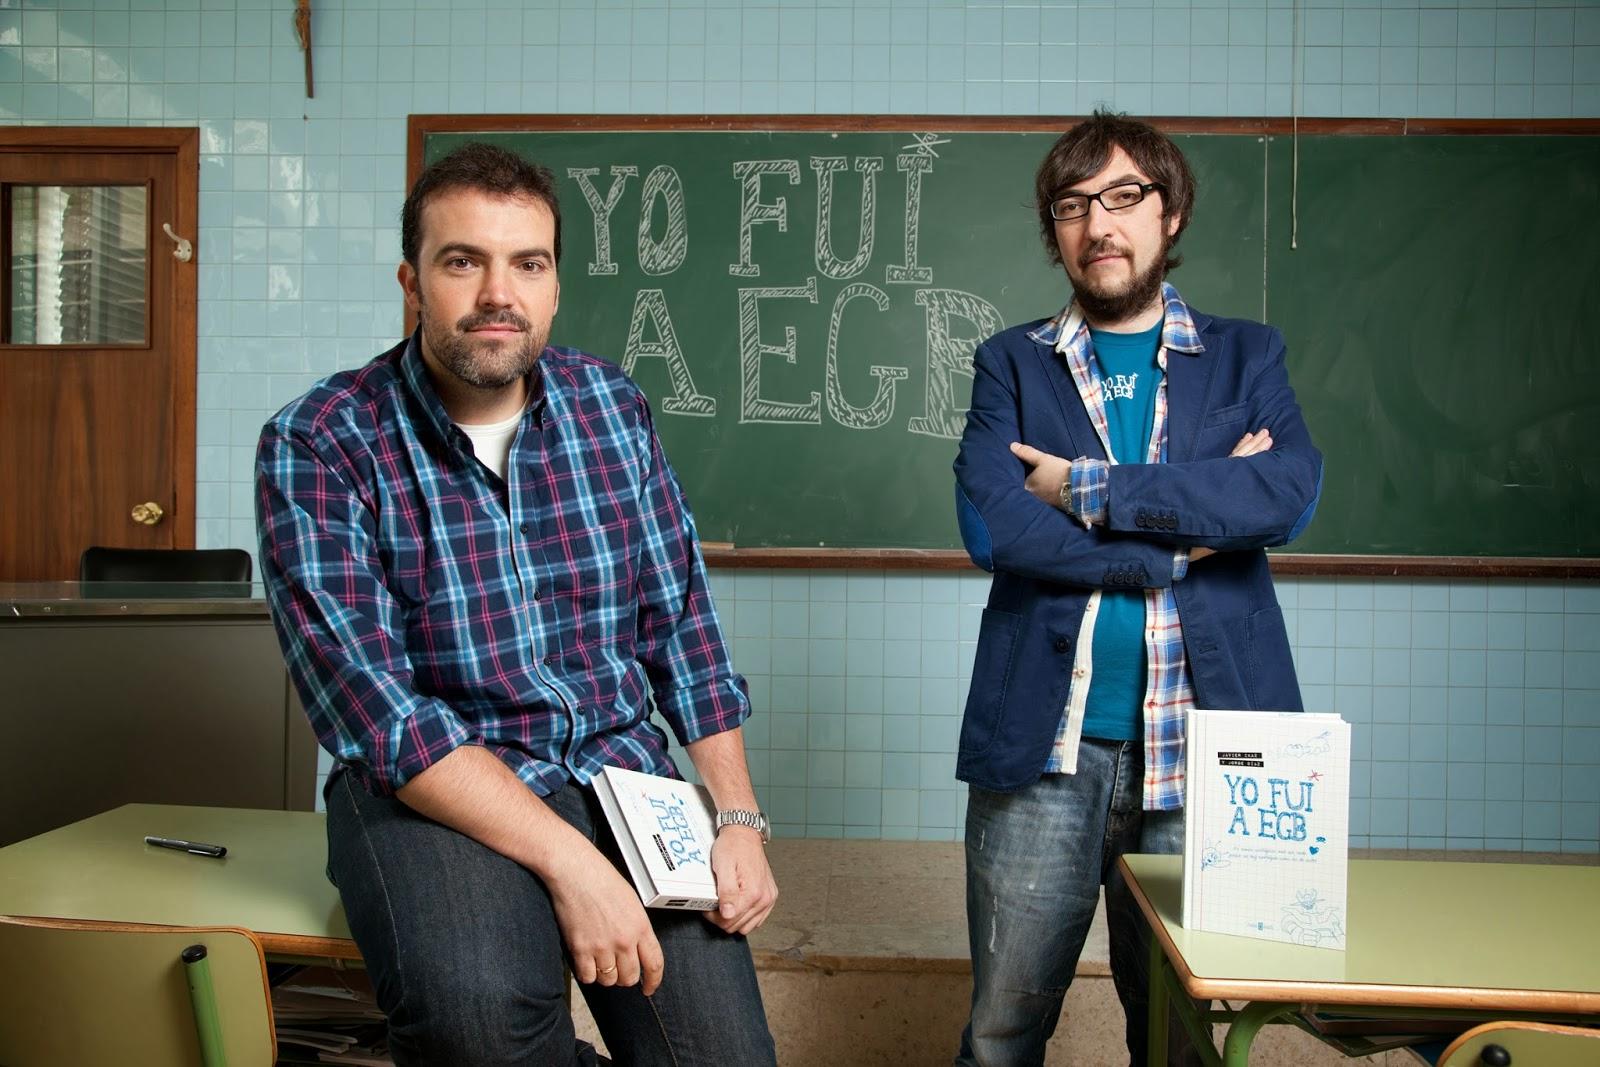 Yo-fui-a-EGB-Jorge-Diaz-Javier-Ikaz-